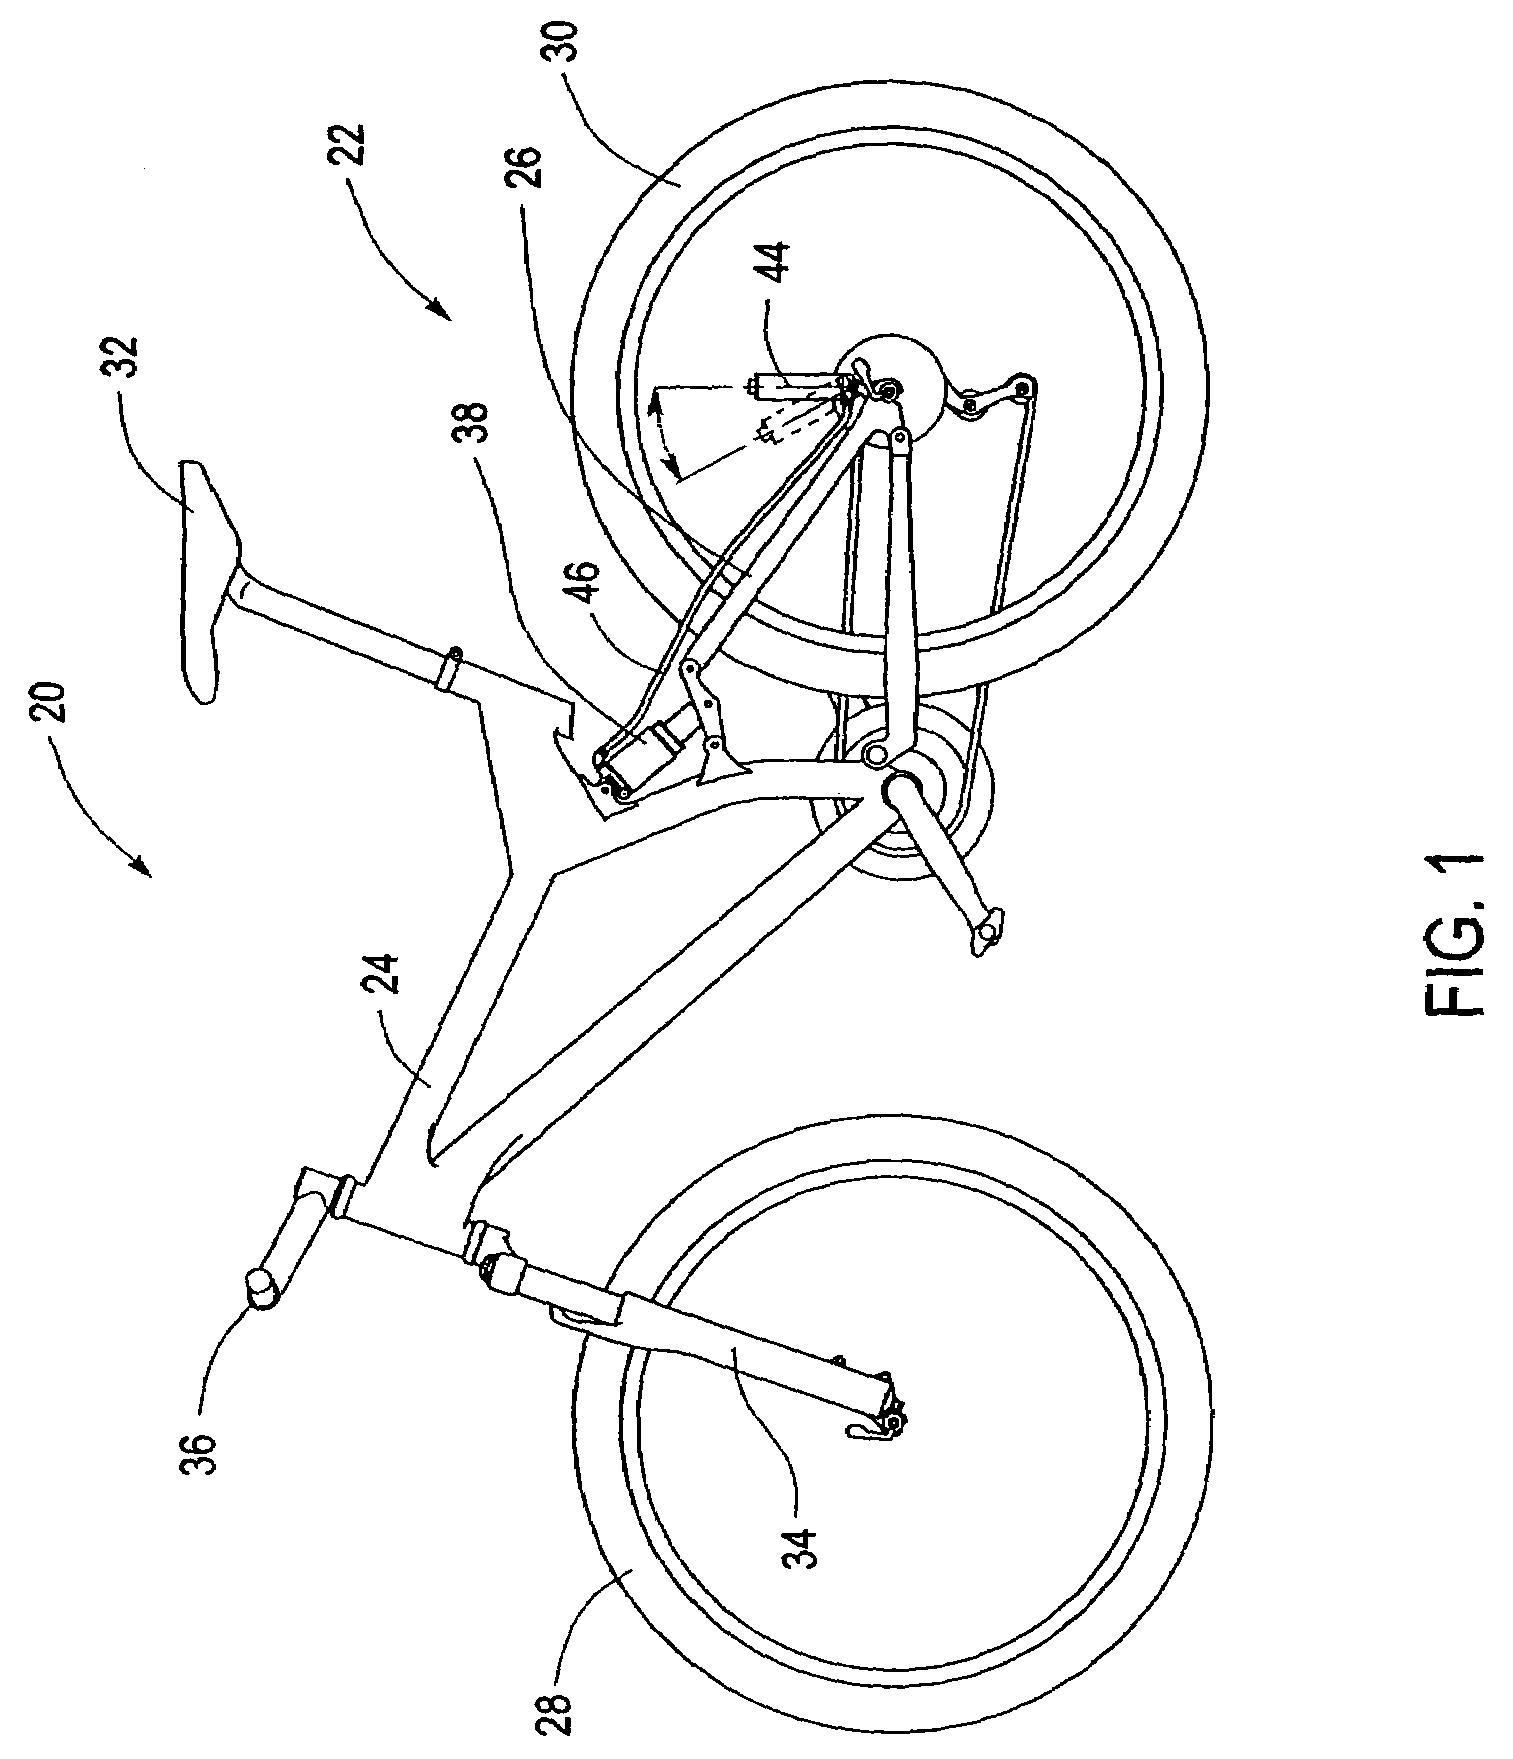 patent us7128192 - inertia valve shock absorber